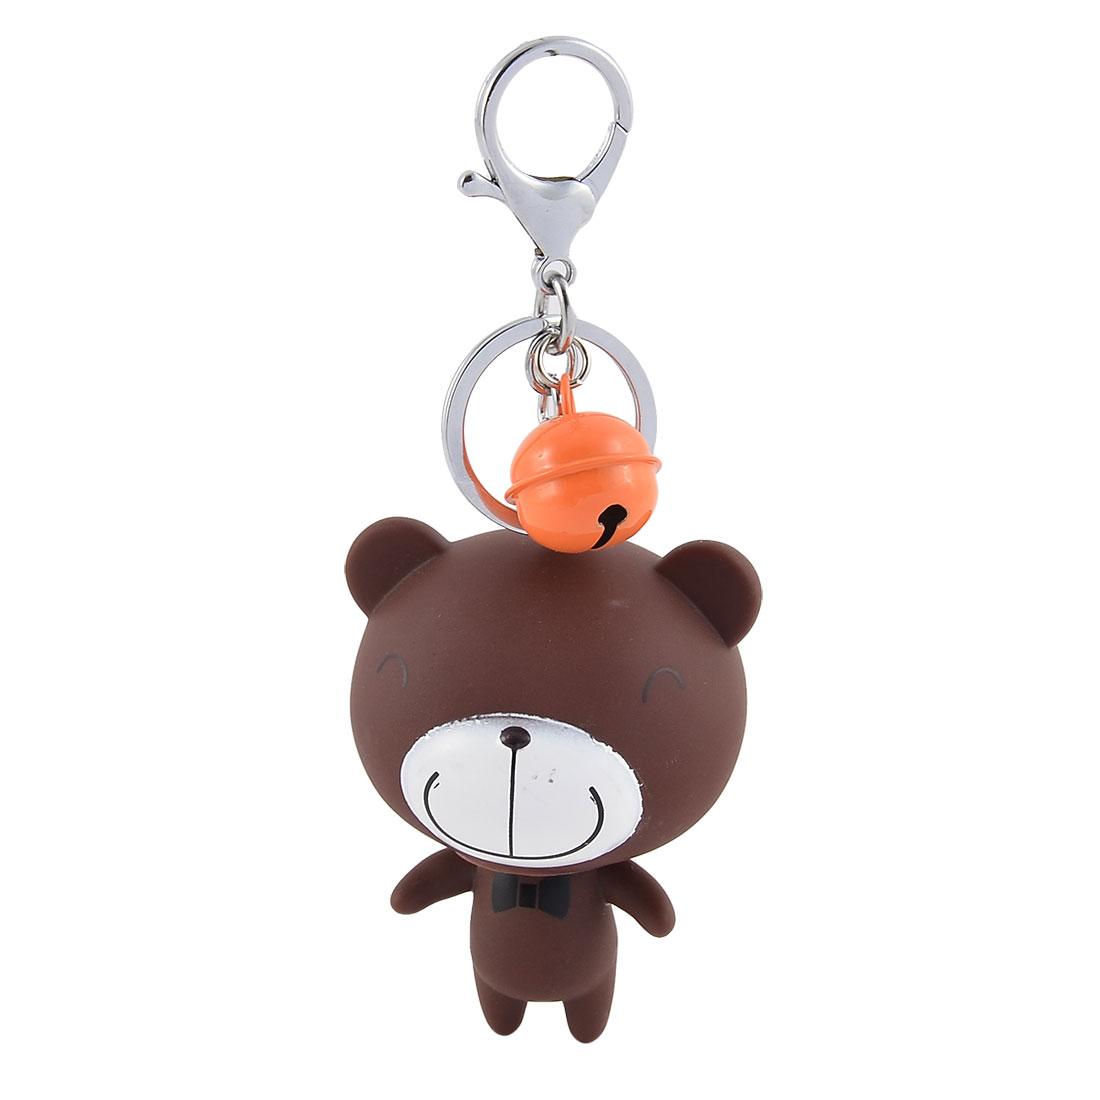 Mobile Phone Bags Bear Shaped Pendant Decoration Keychain Key Ring Keyring